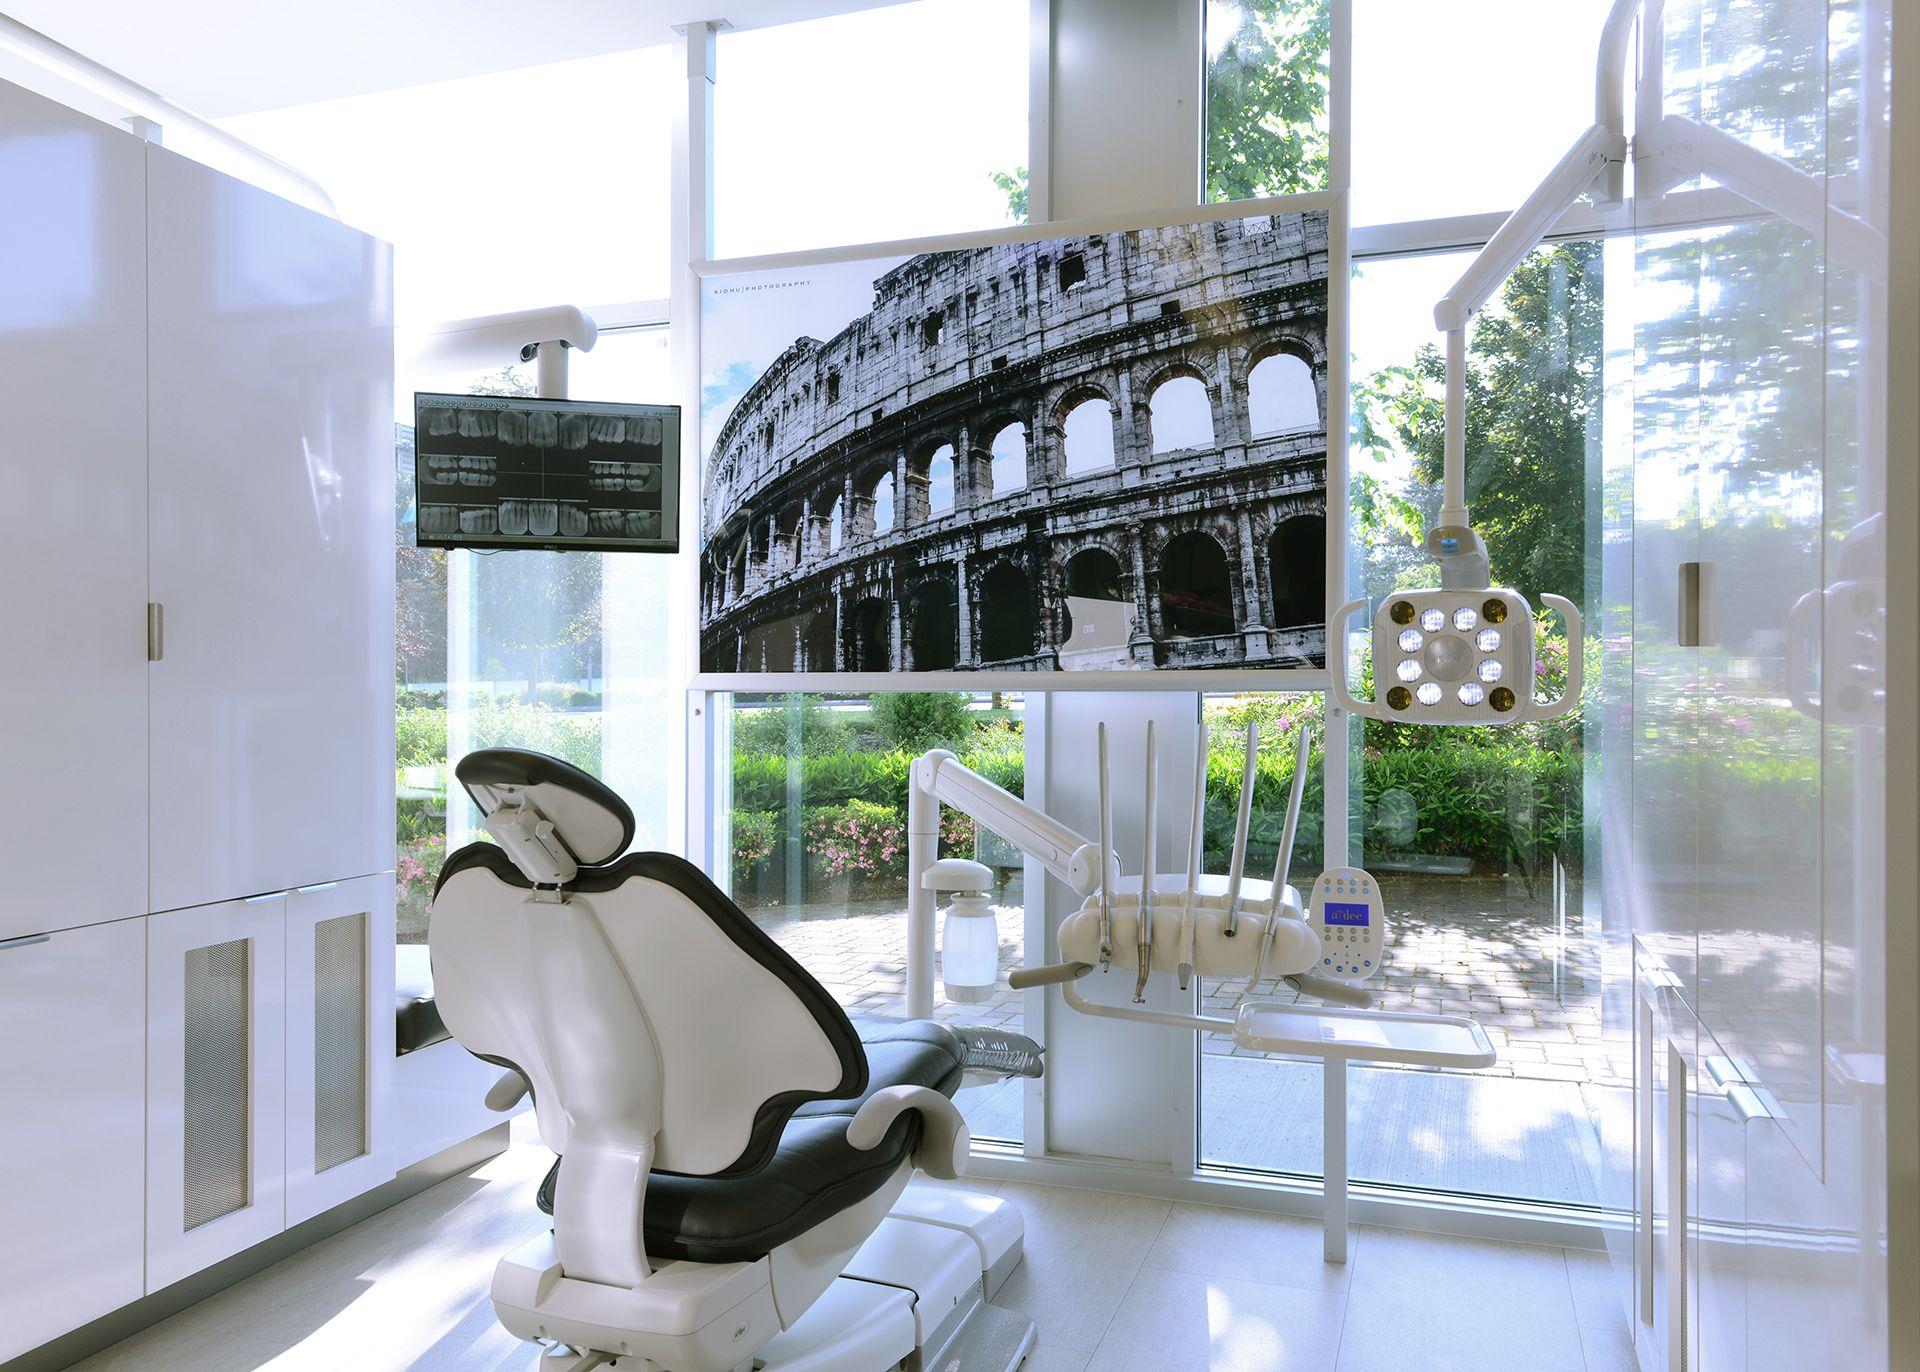 Lighthouse Dental - Operatory